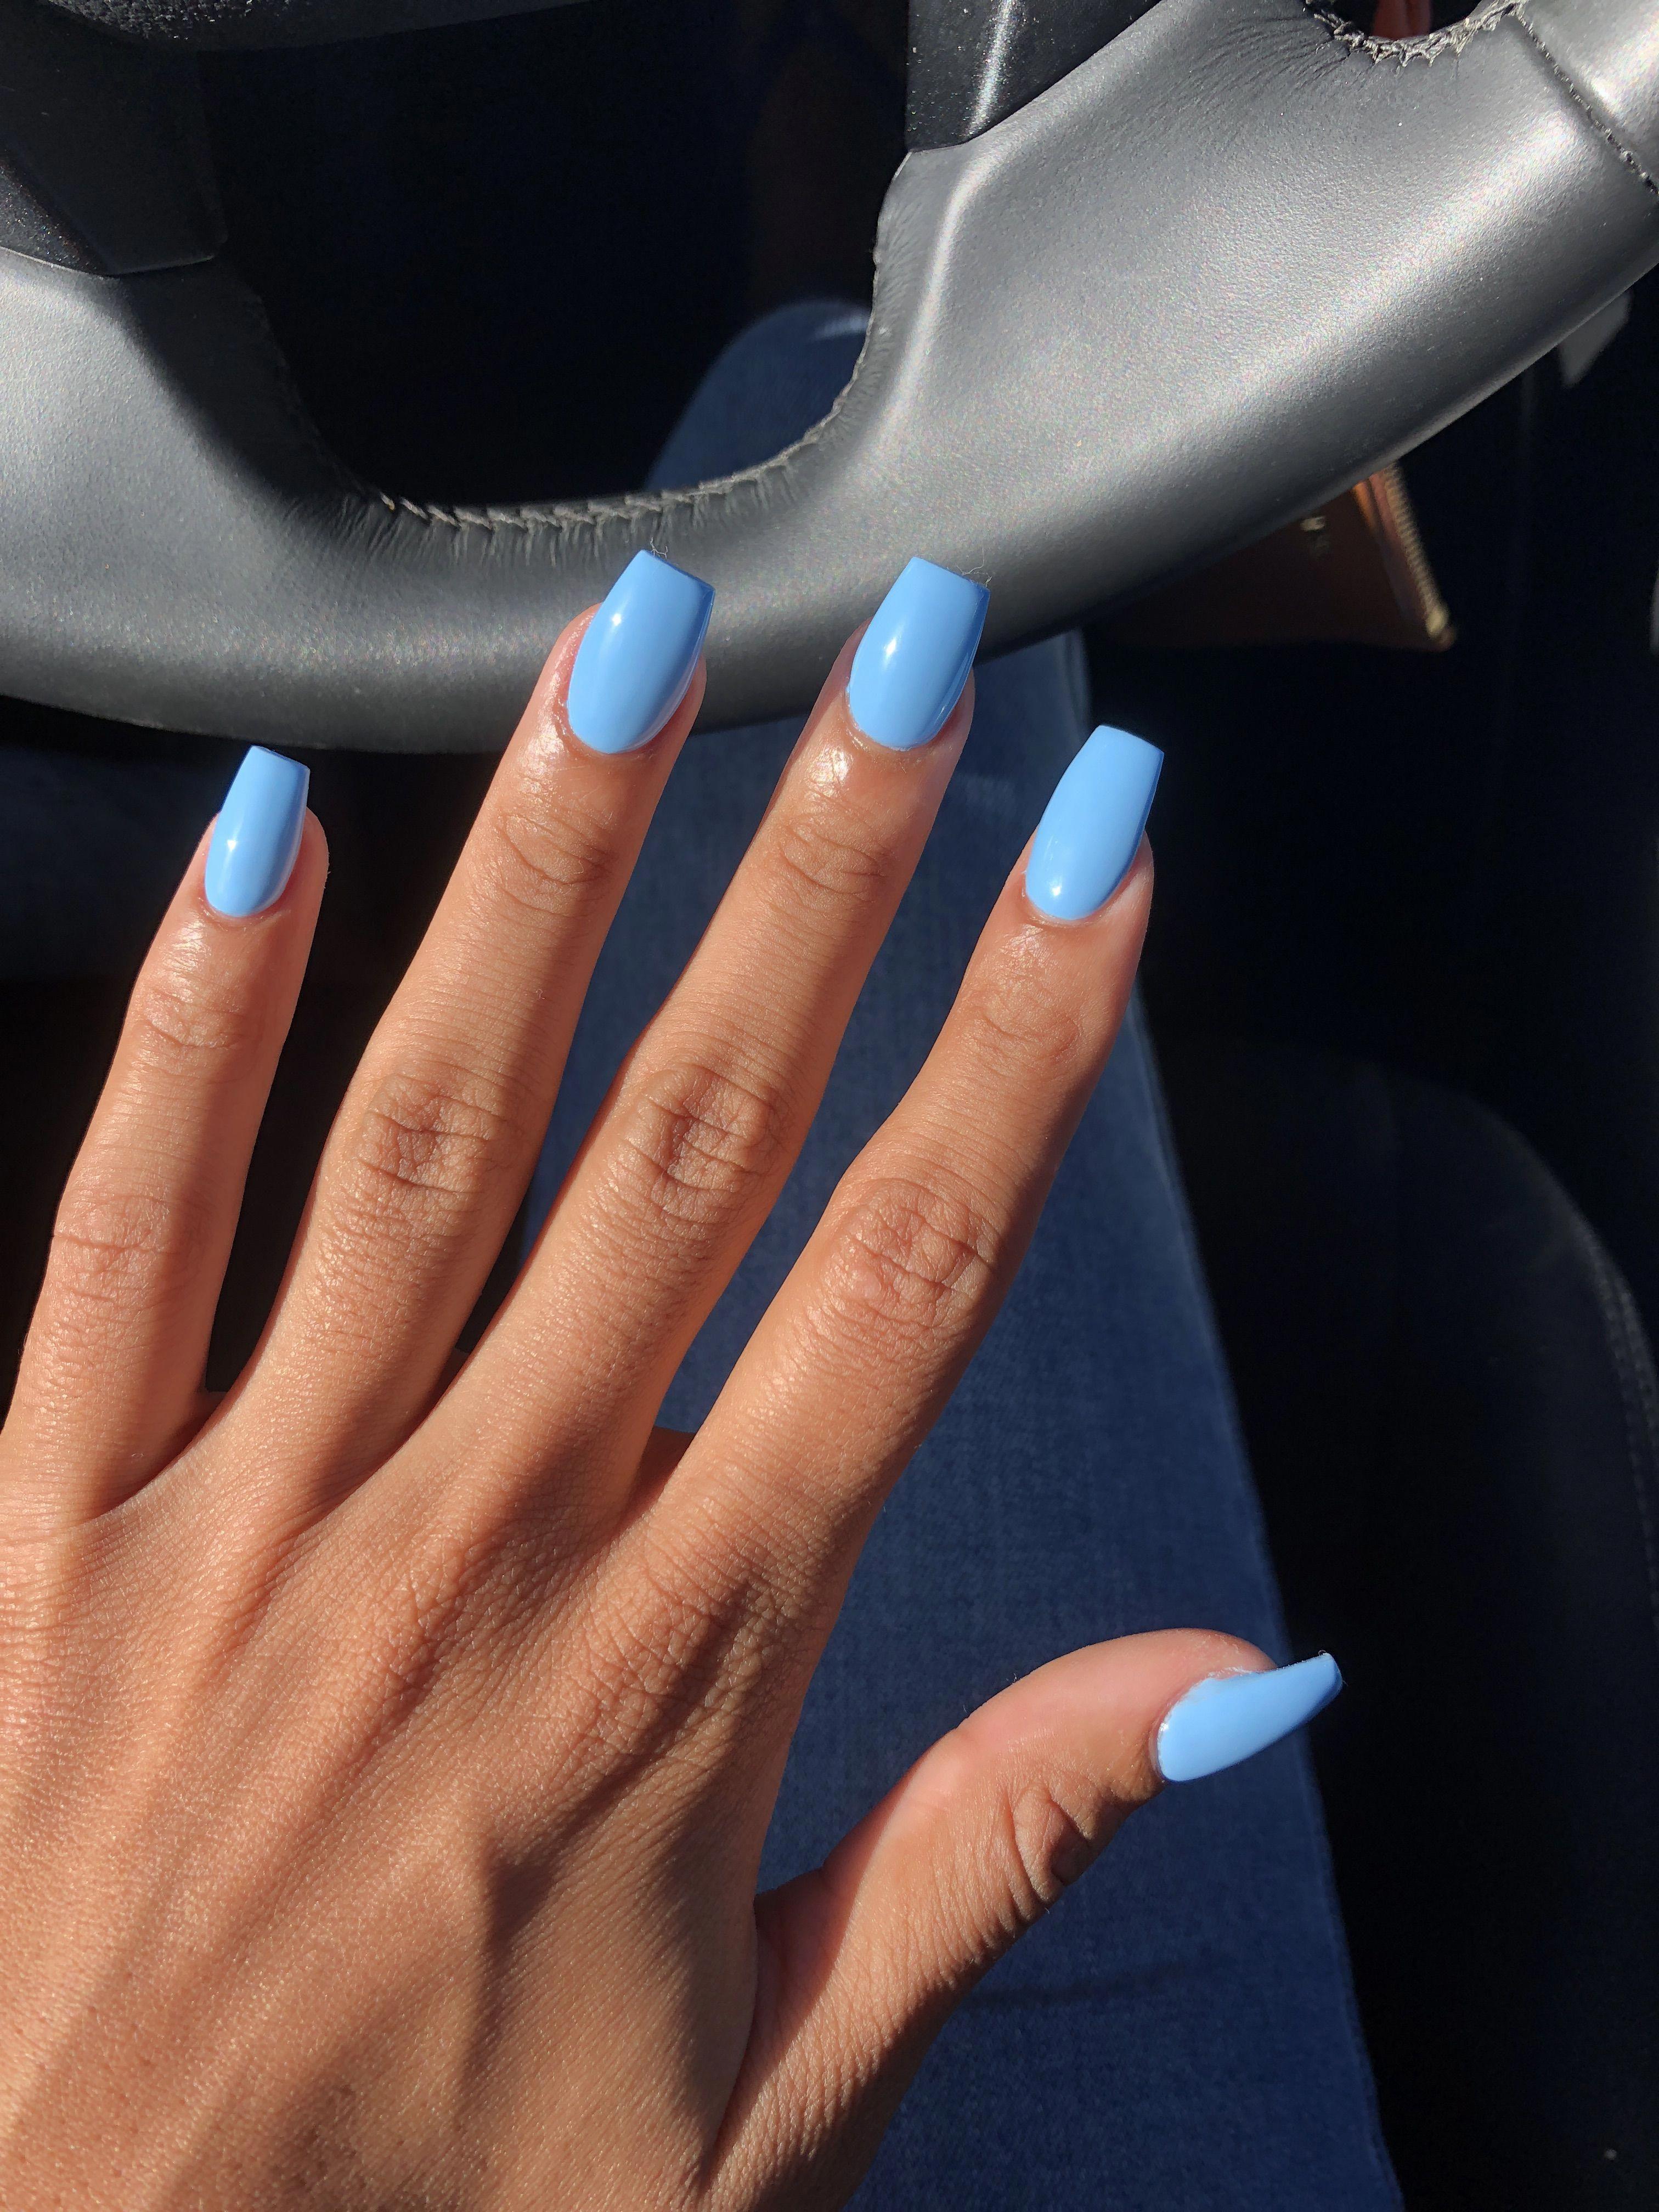 Blue Acrylic Coffin Nails Summer Acrylicnailart With Images Blue Acrylic Nails Short Acrylic Nails Cute Acrylic Nails